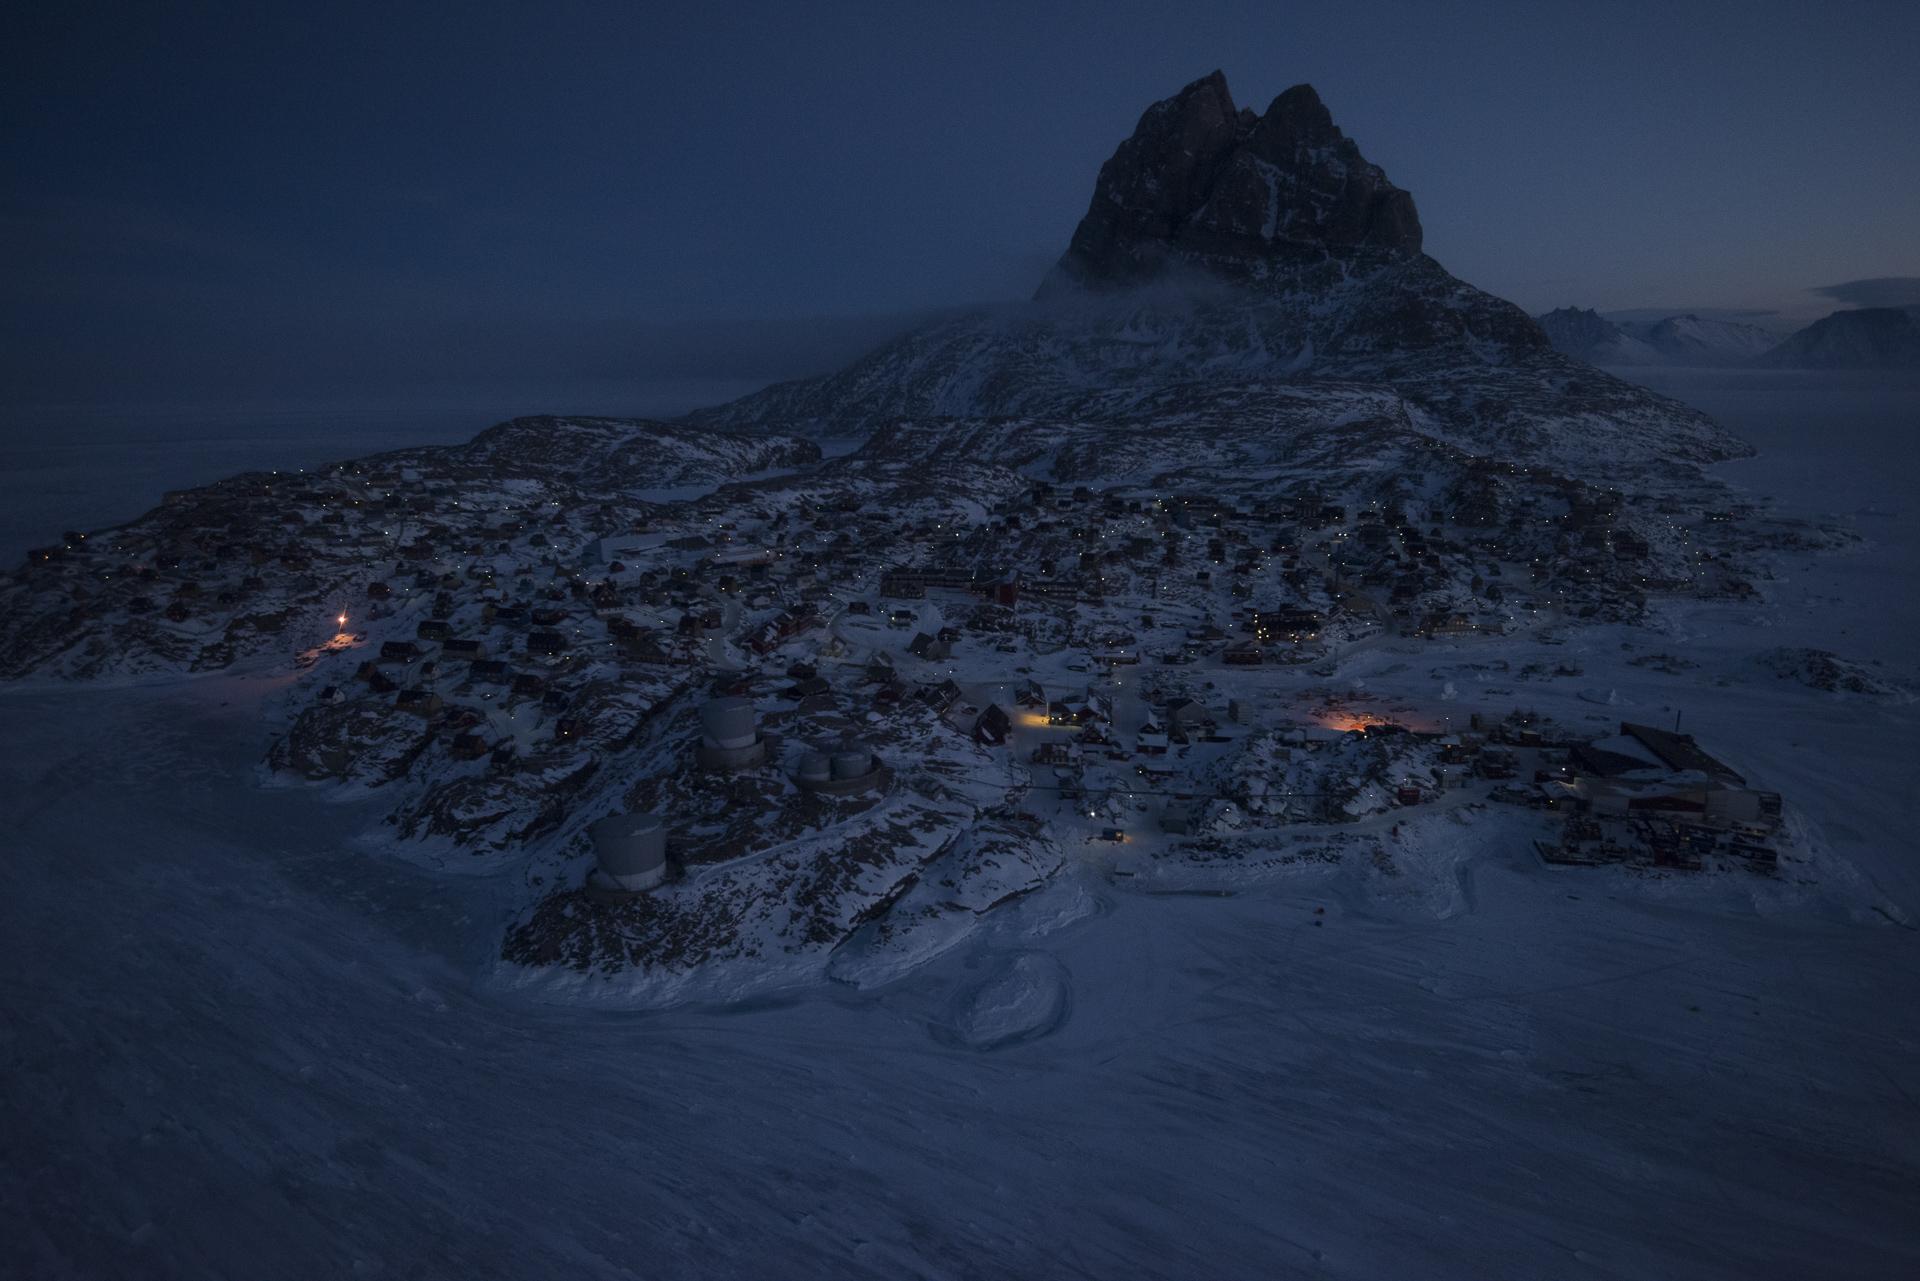 33.Defibaugh_Greenland_Uummannaq_a_107.jpg